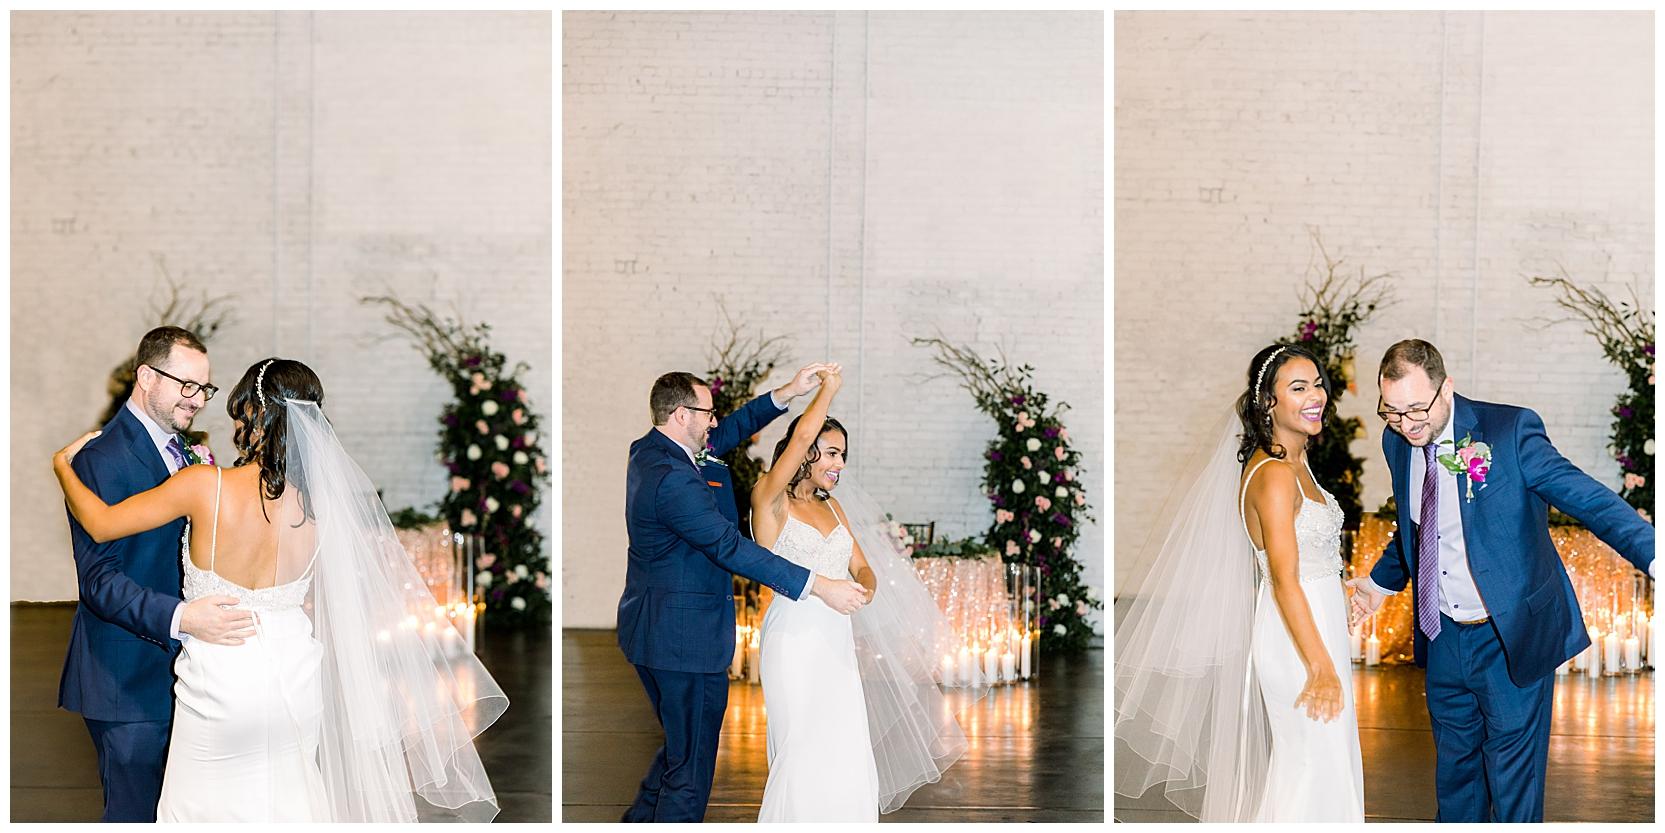 jessicafredericks_lakeland_tampa_wedding_purple_crazy hour_0073.jpg